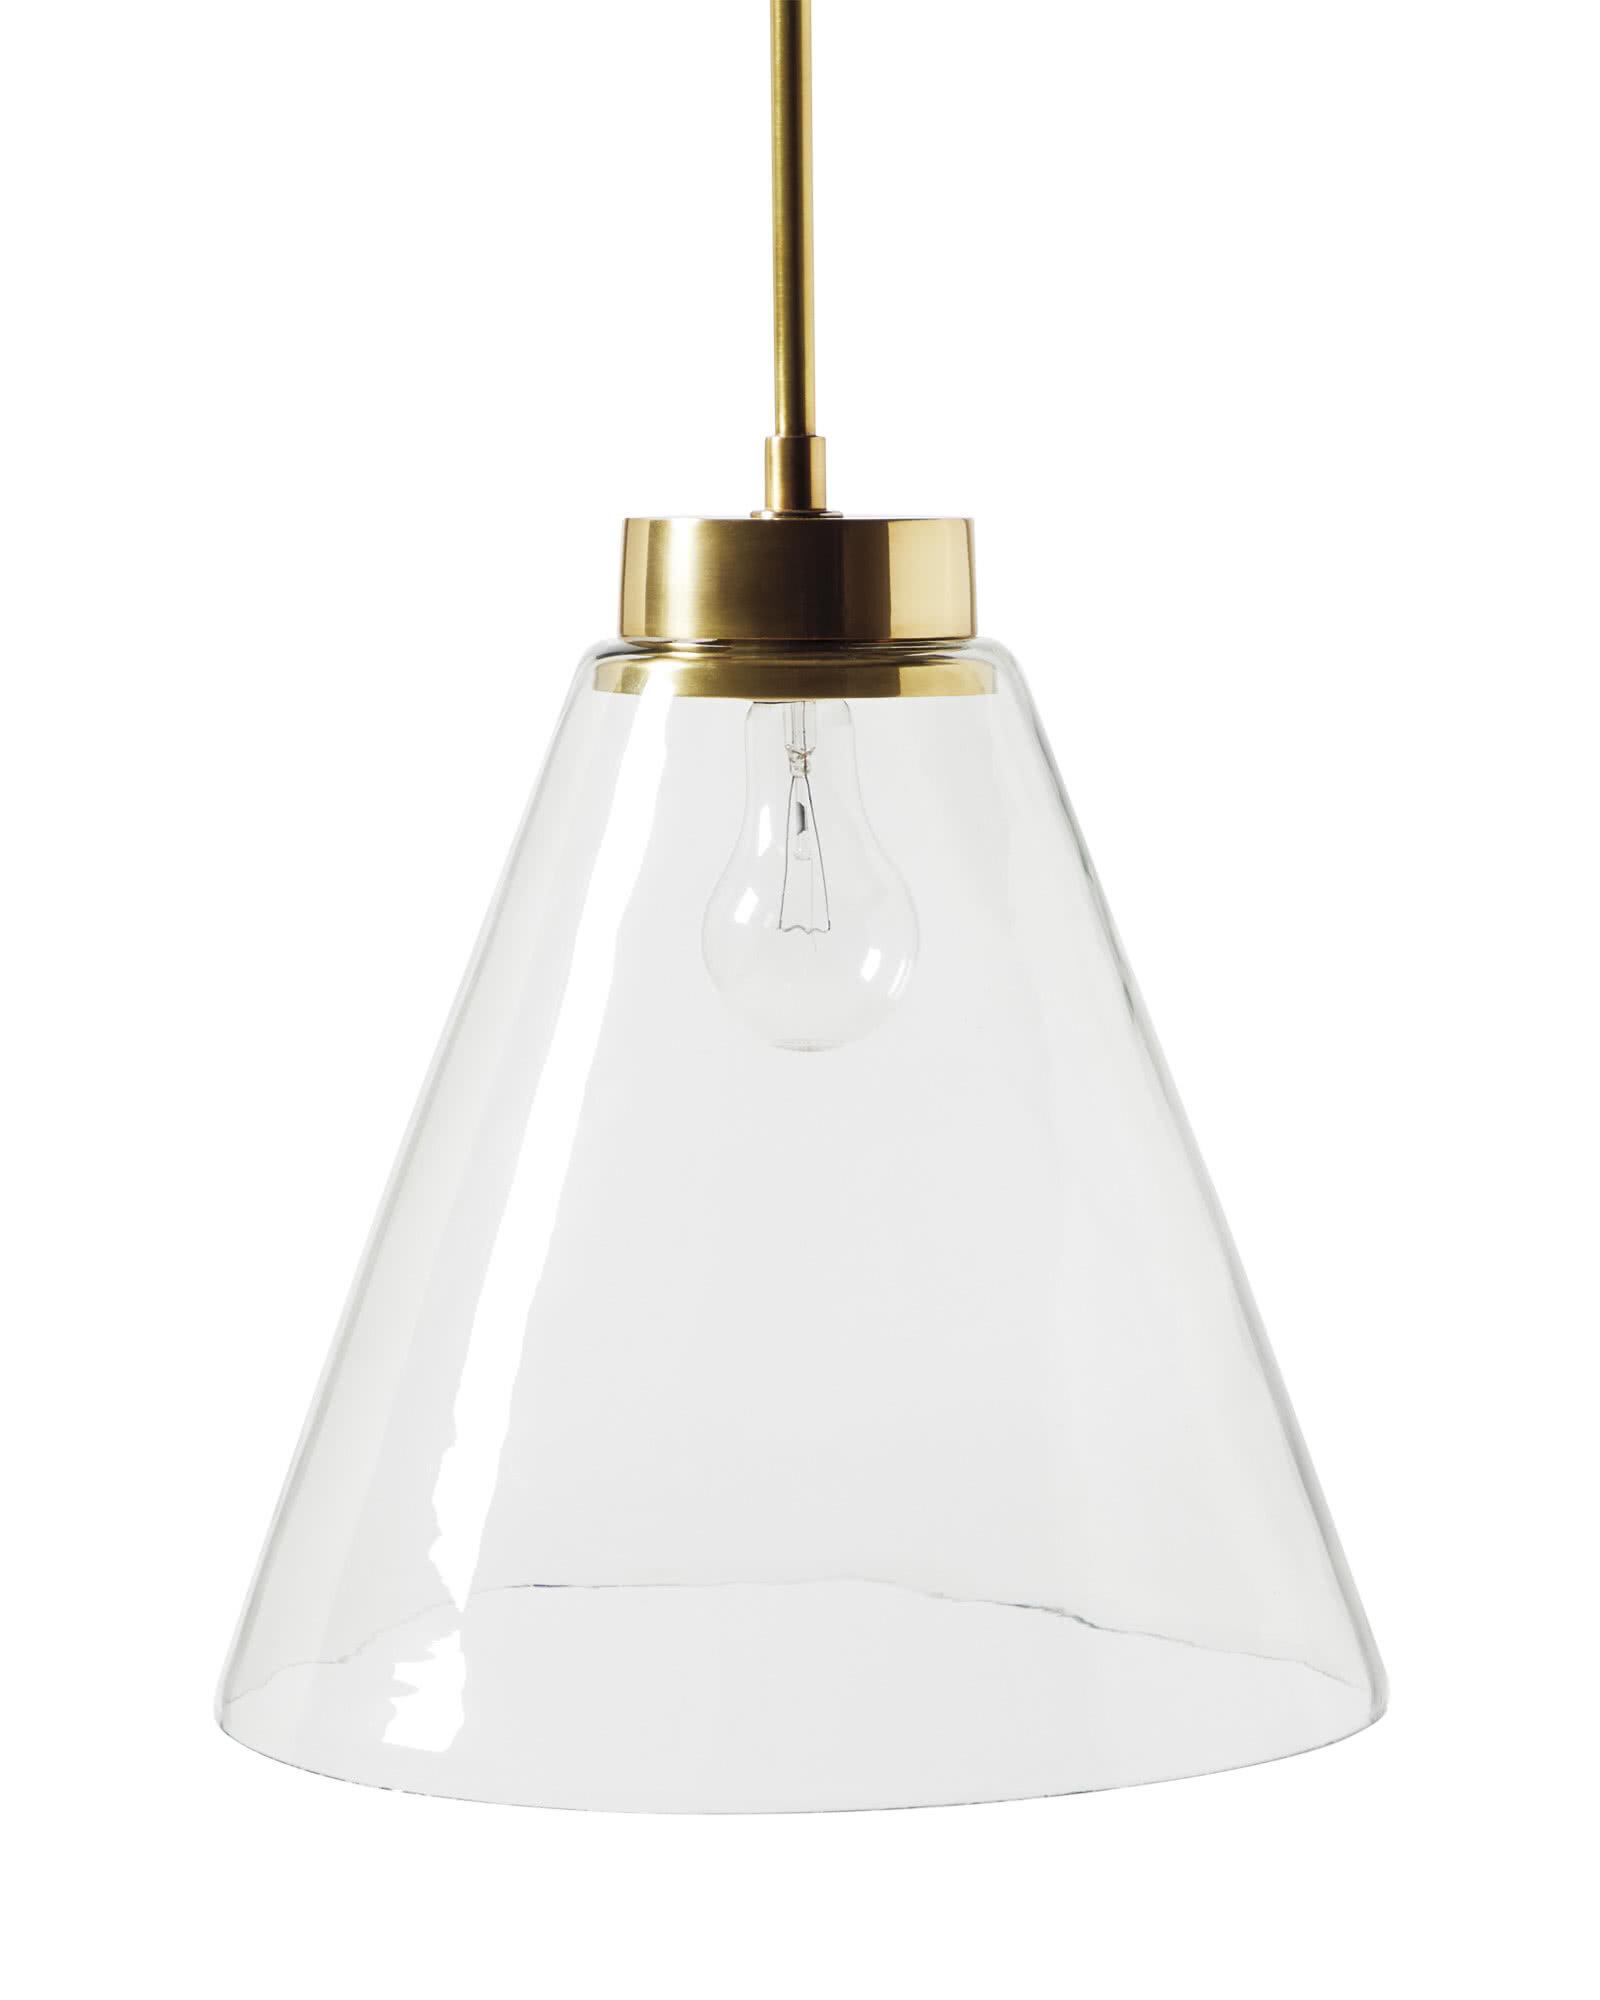 Lighting_Claremont_Pendant_Brass_Single_Large_MV_0266_Crop_SH.jpg